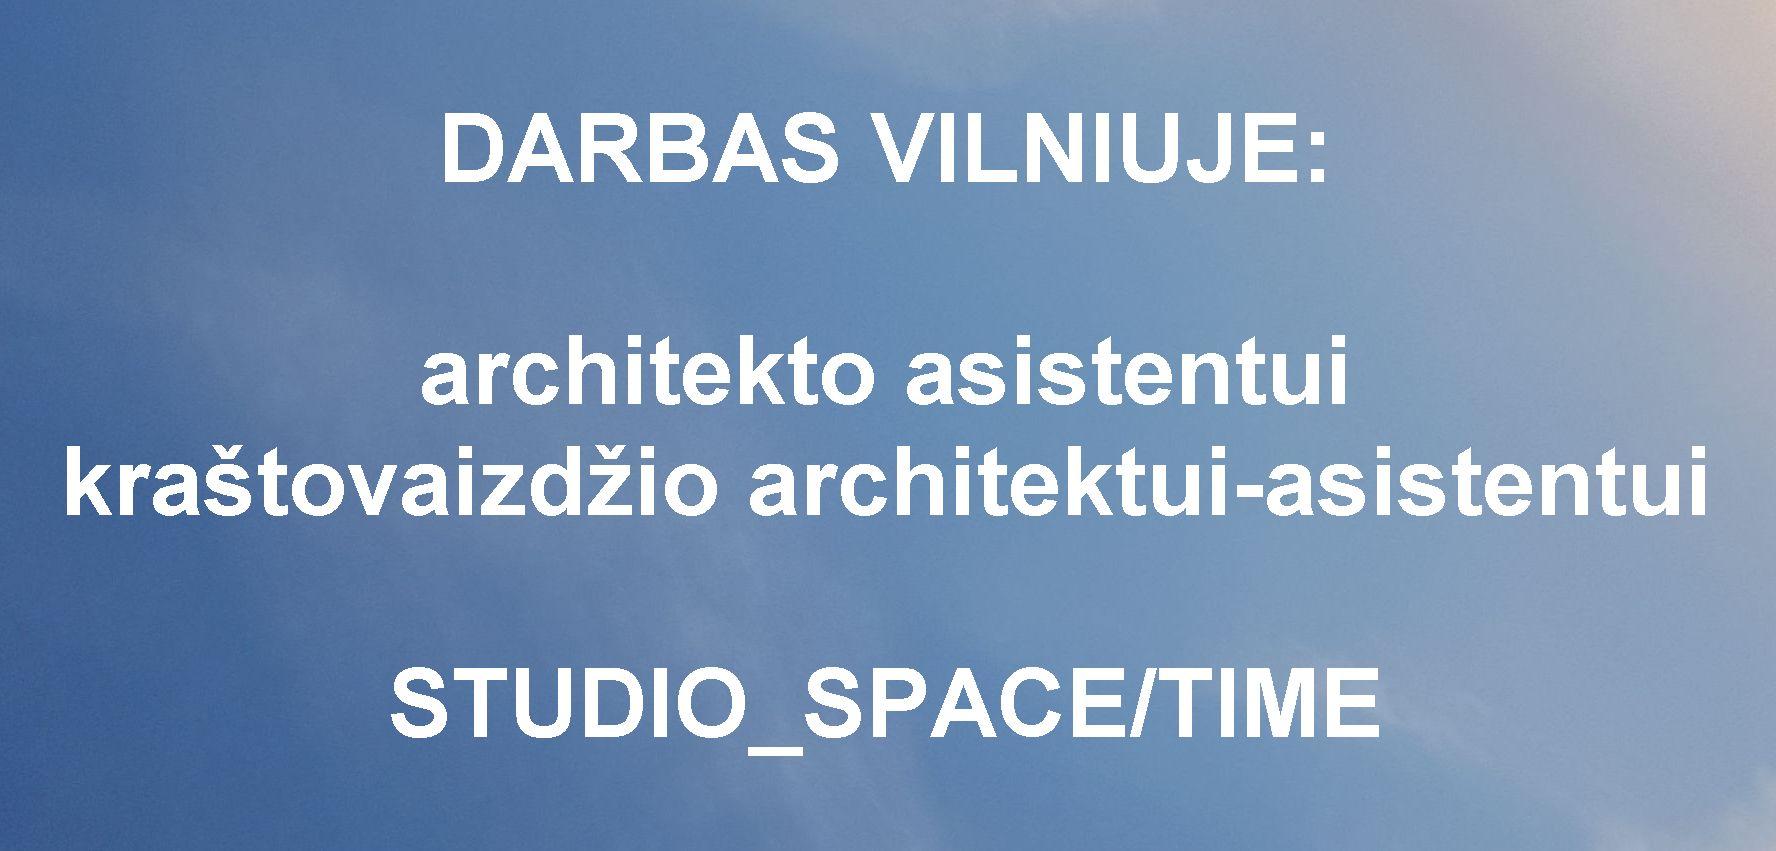 STUDIO_SPACE/TIME